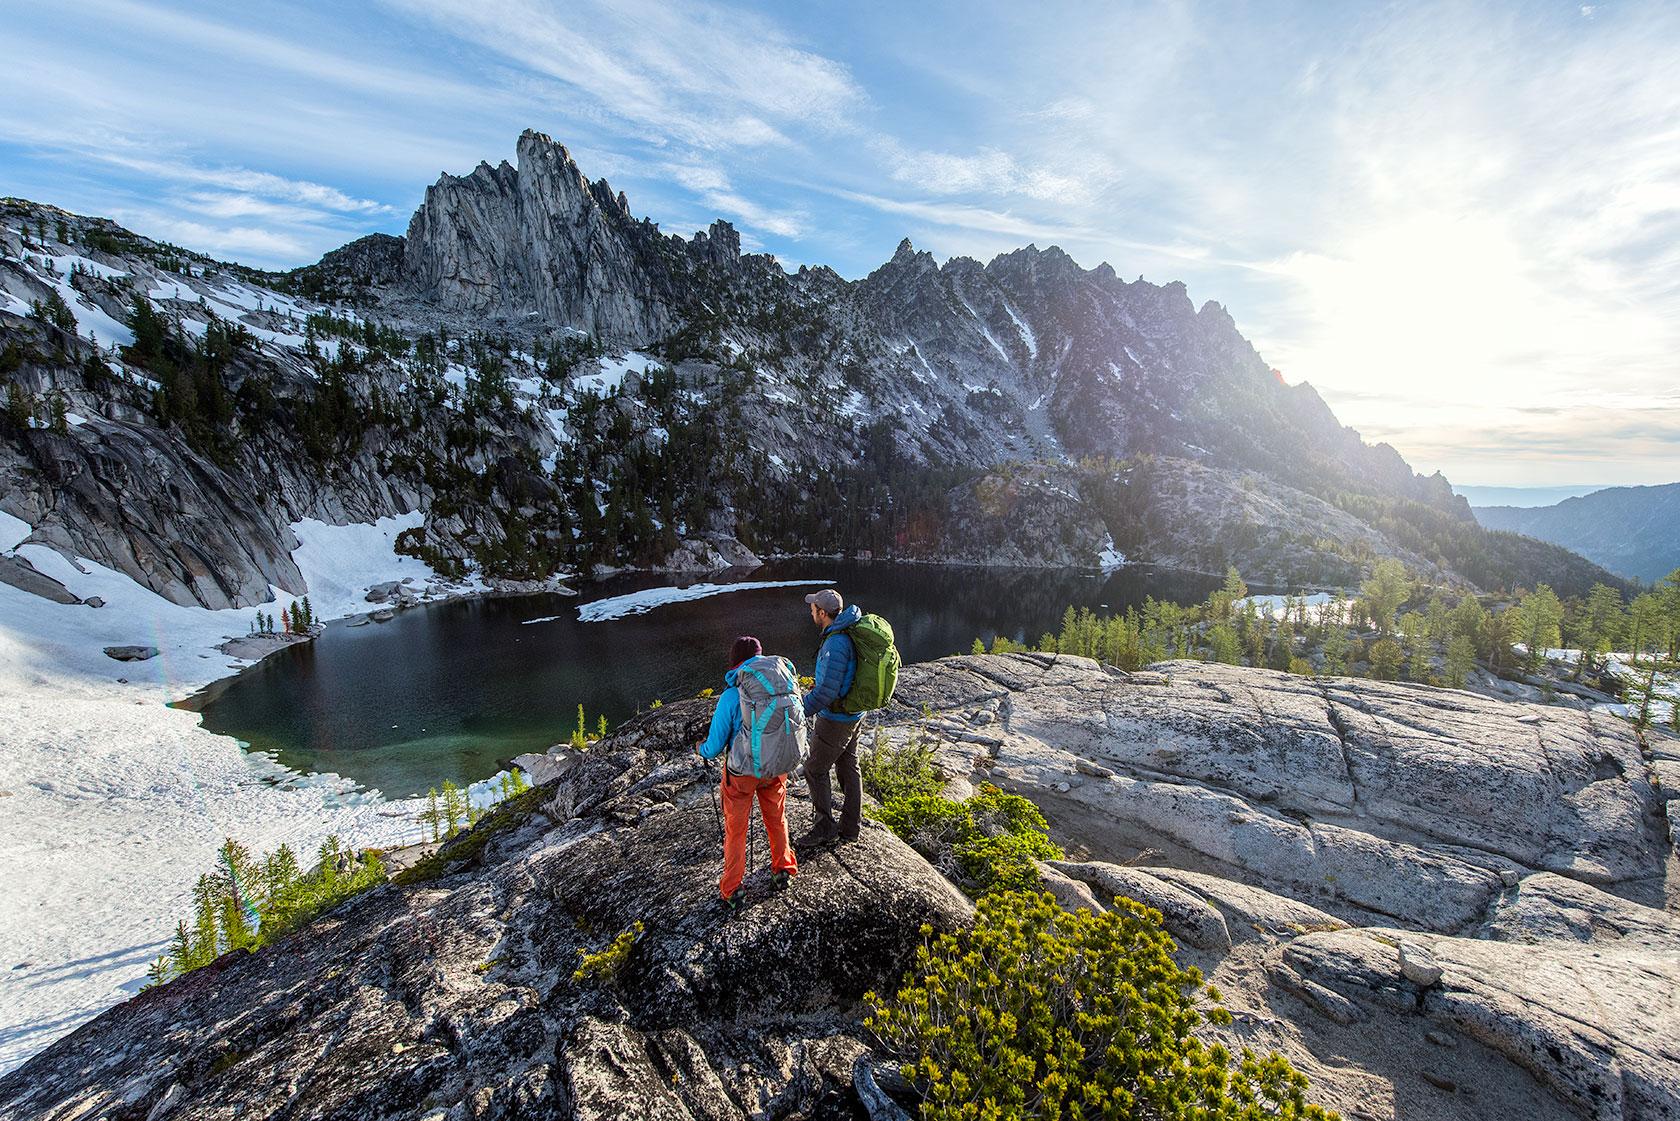 austin-trigg-osprey-hiking-backpacks-hike-camp-washington-adventure-morning-sunrise-lifestyle-outdoor-enchantments-alpine-lake-prusik-peak-wilderness.jpg